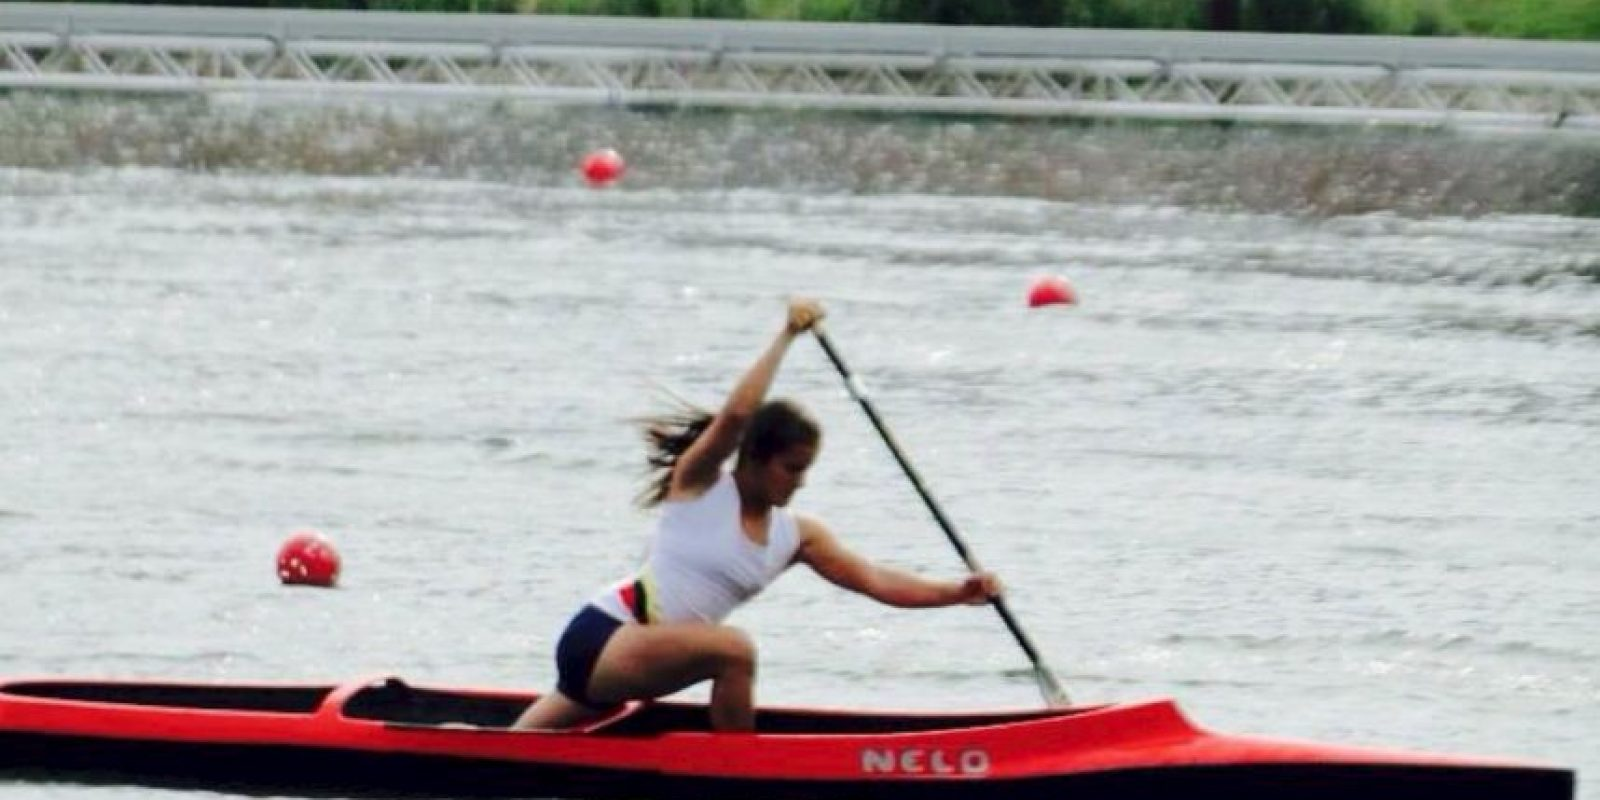 La ecuatoriana se llevó a casa la presea de plata en canotaje de 200 metros Foto:Vía facebook.com/anggie.avegno